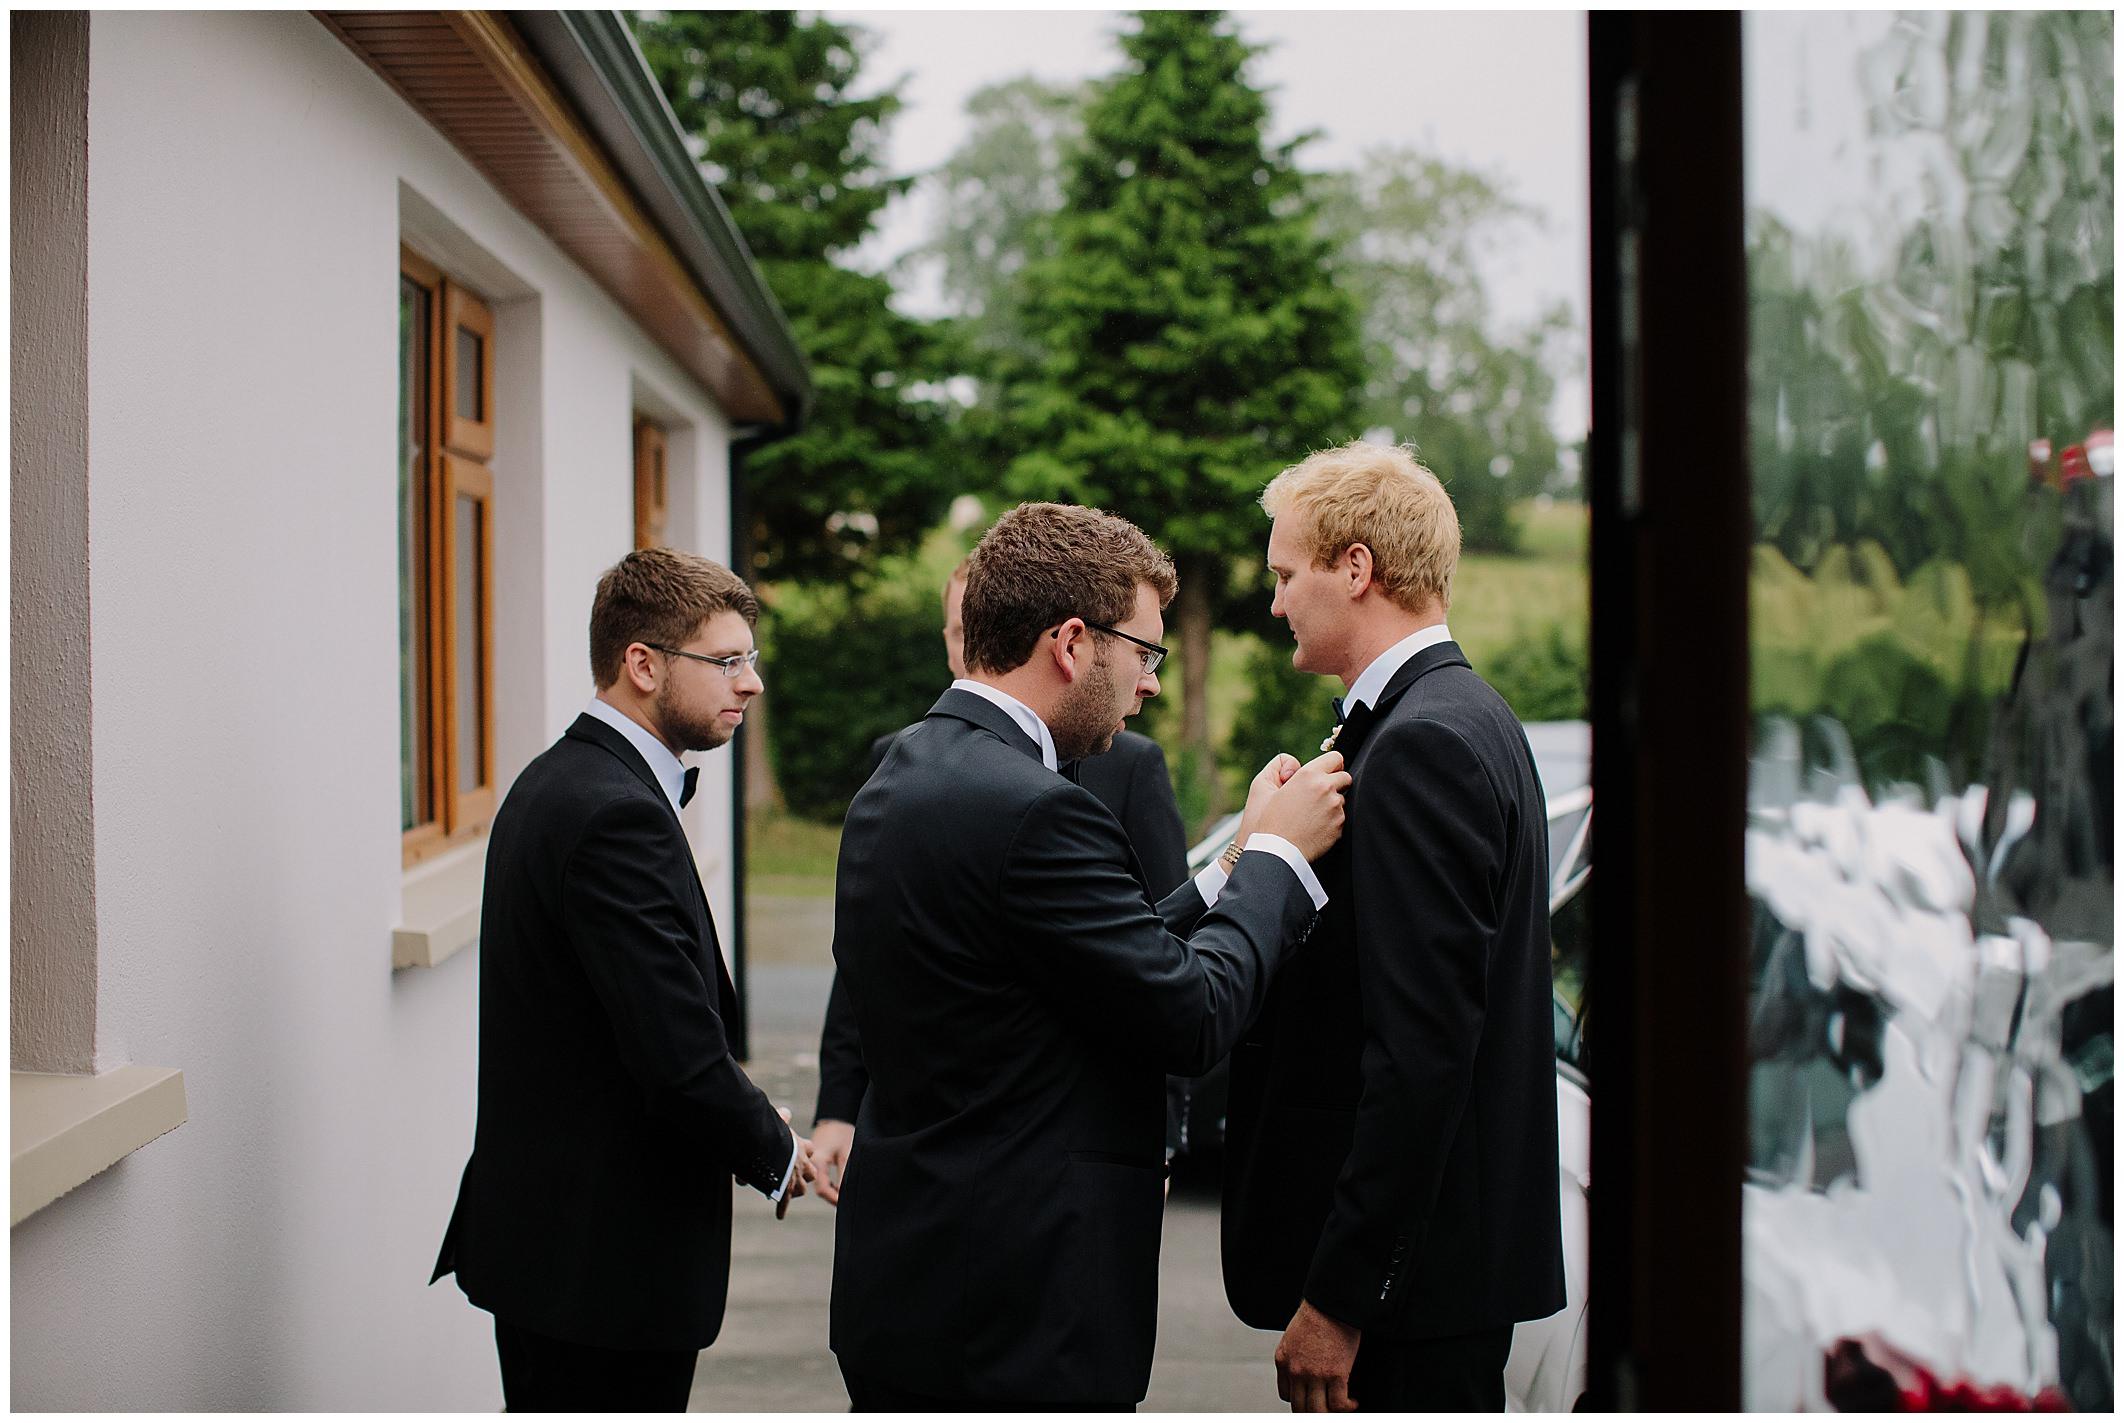 farnham-estate-wedding-jude-browne-photography_0055.jpg